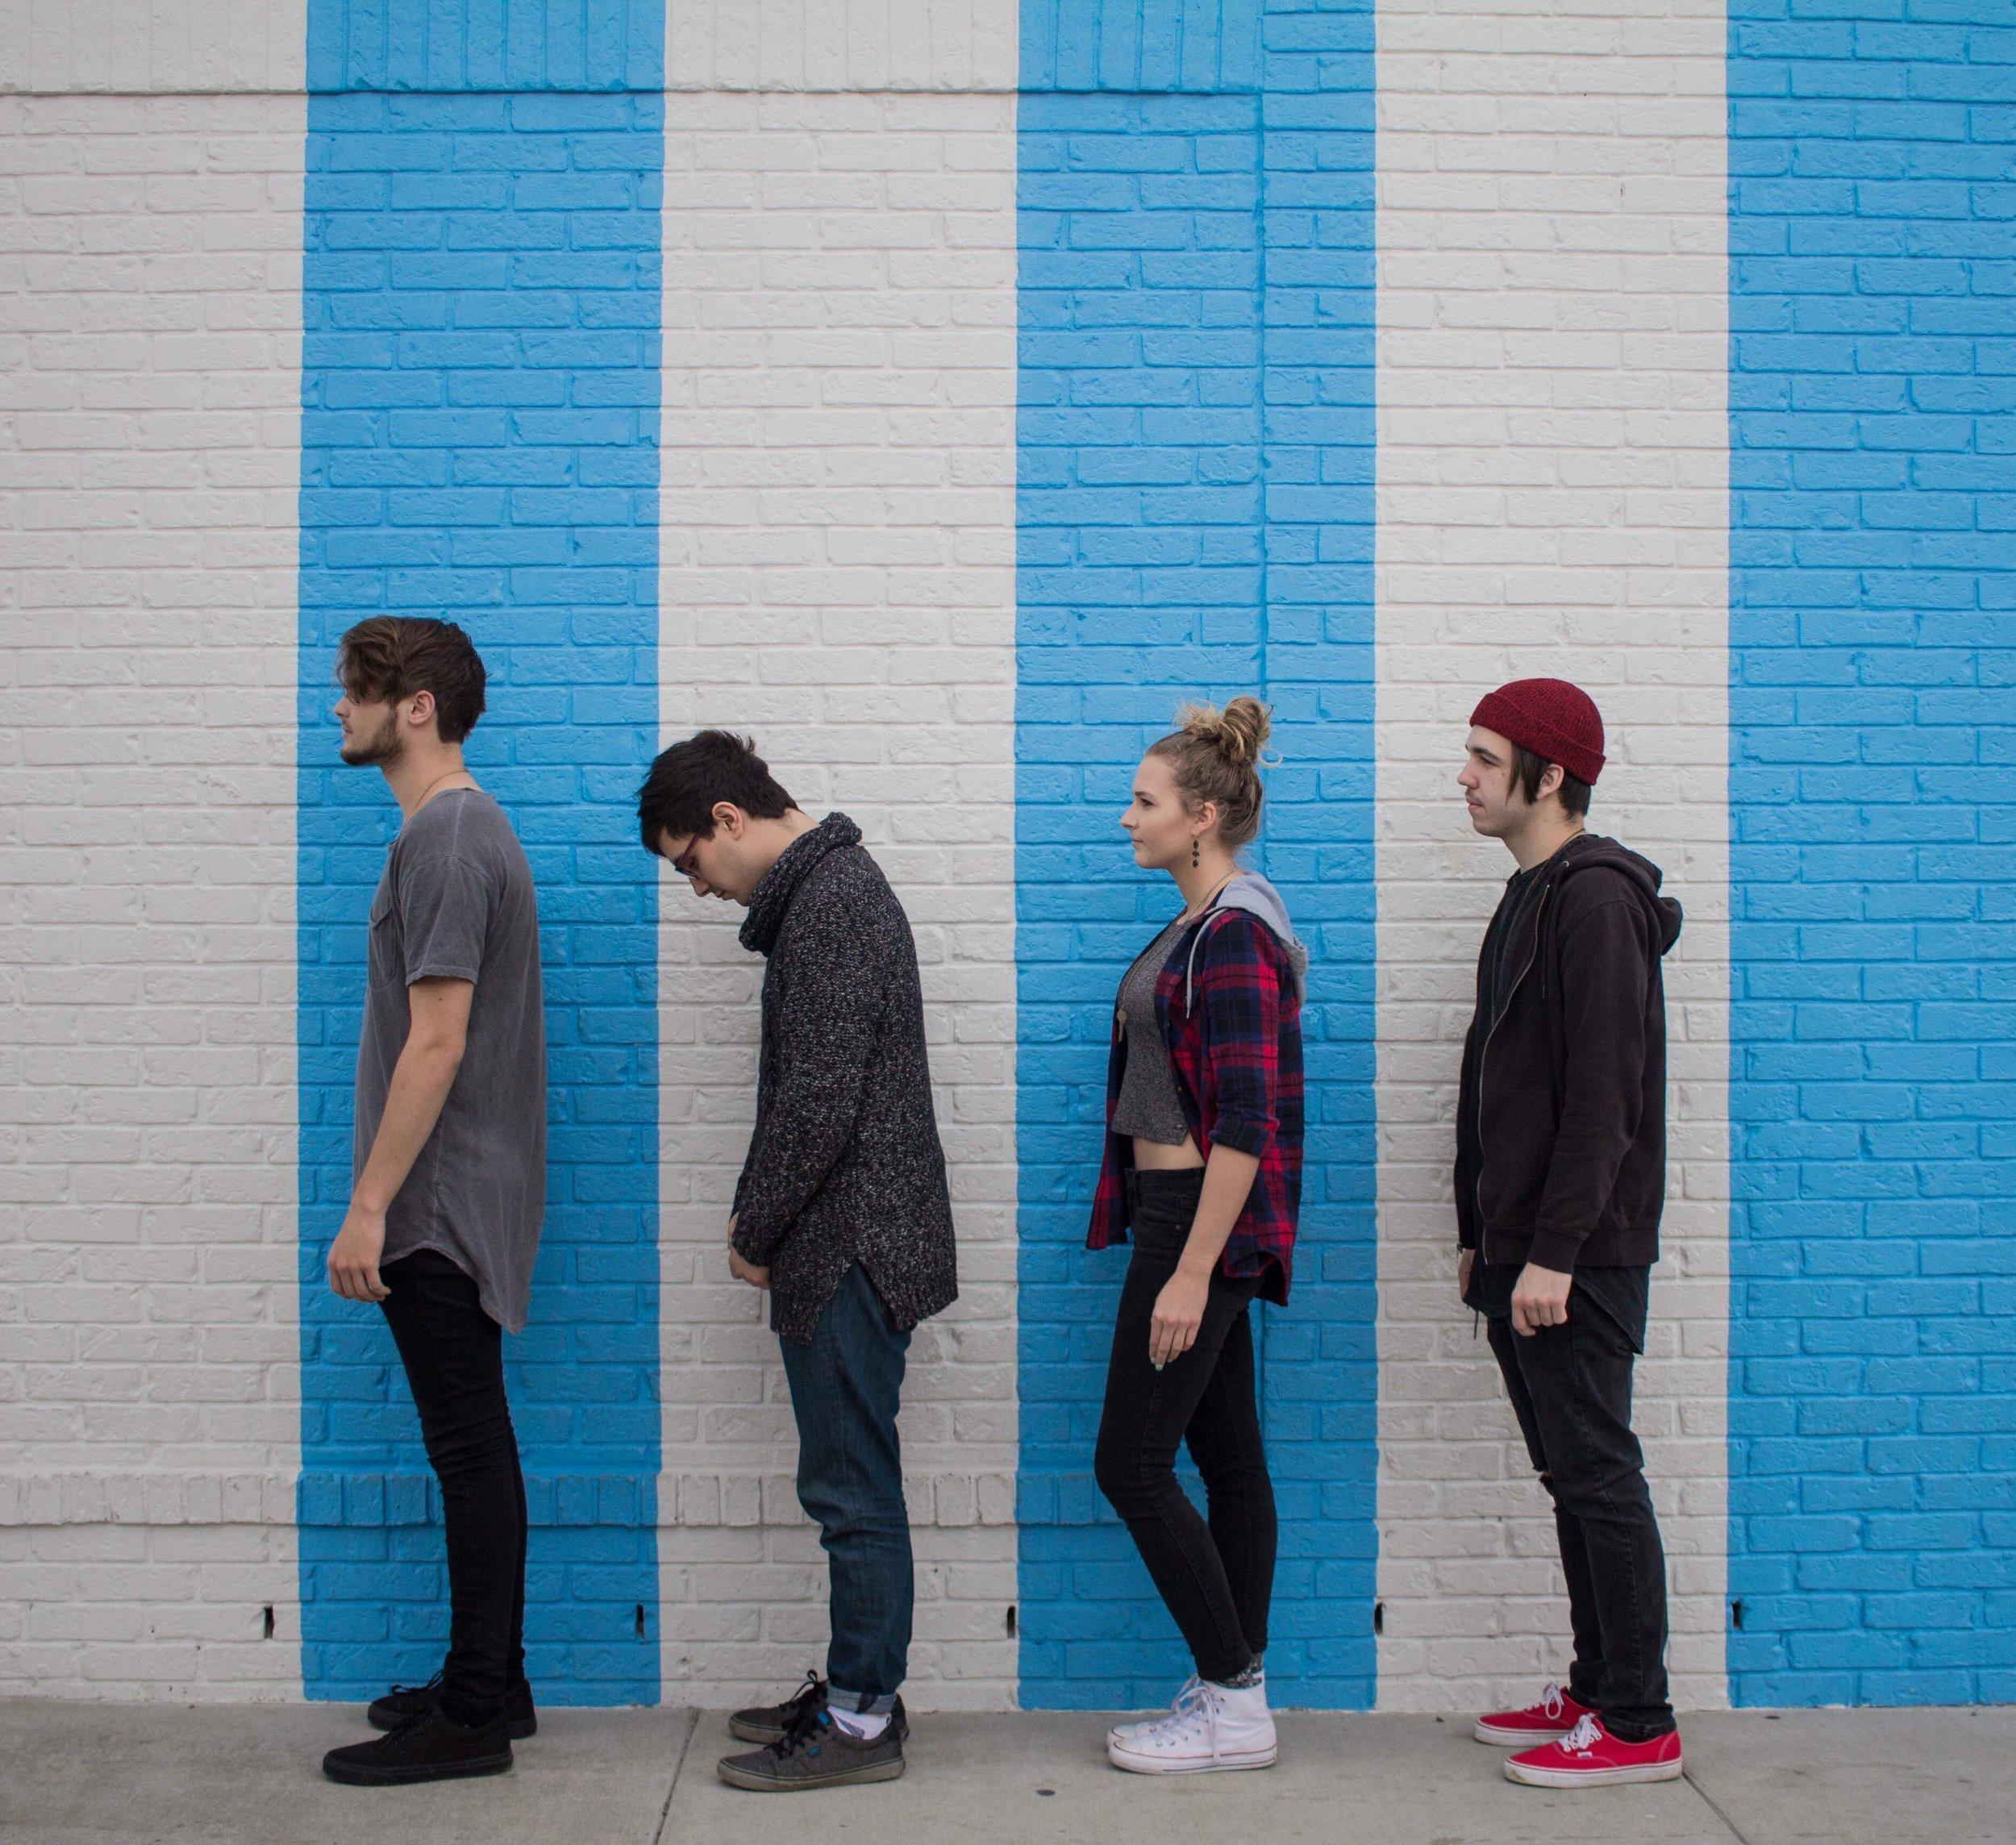 Left to Right: Ryan, Eric, Nikki and Zach